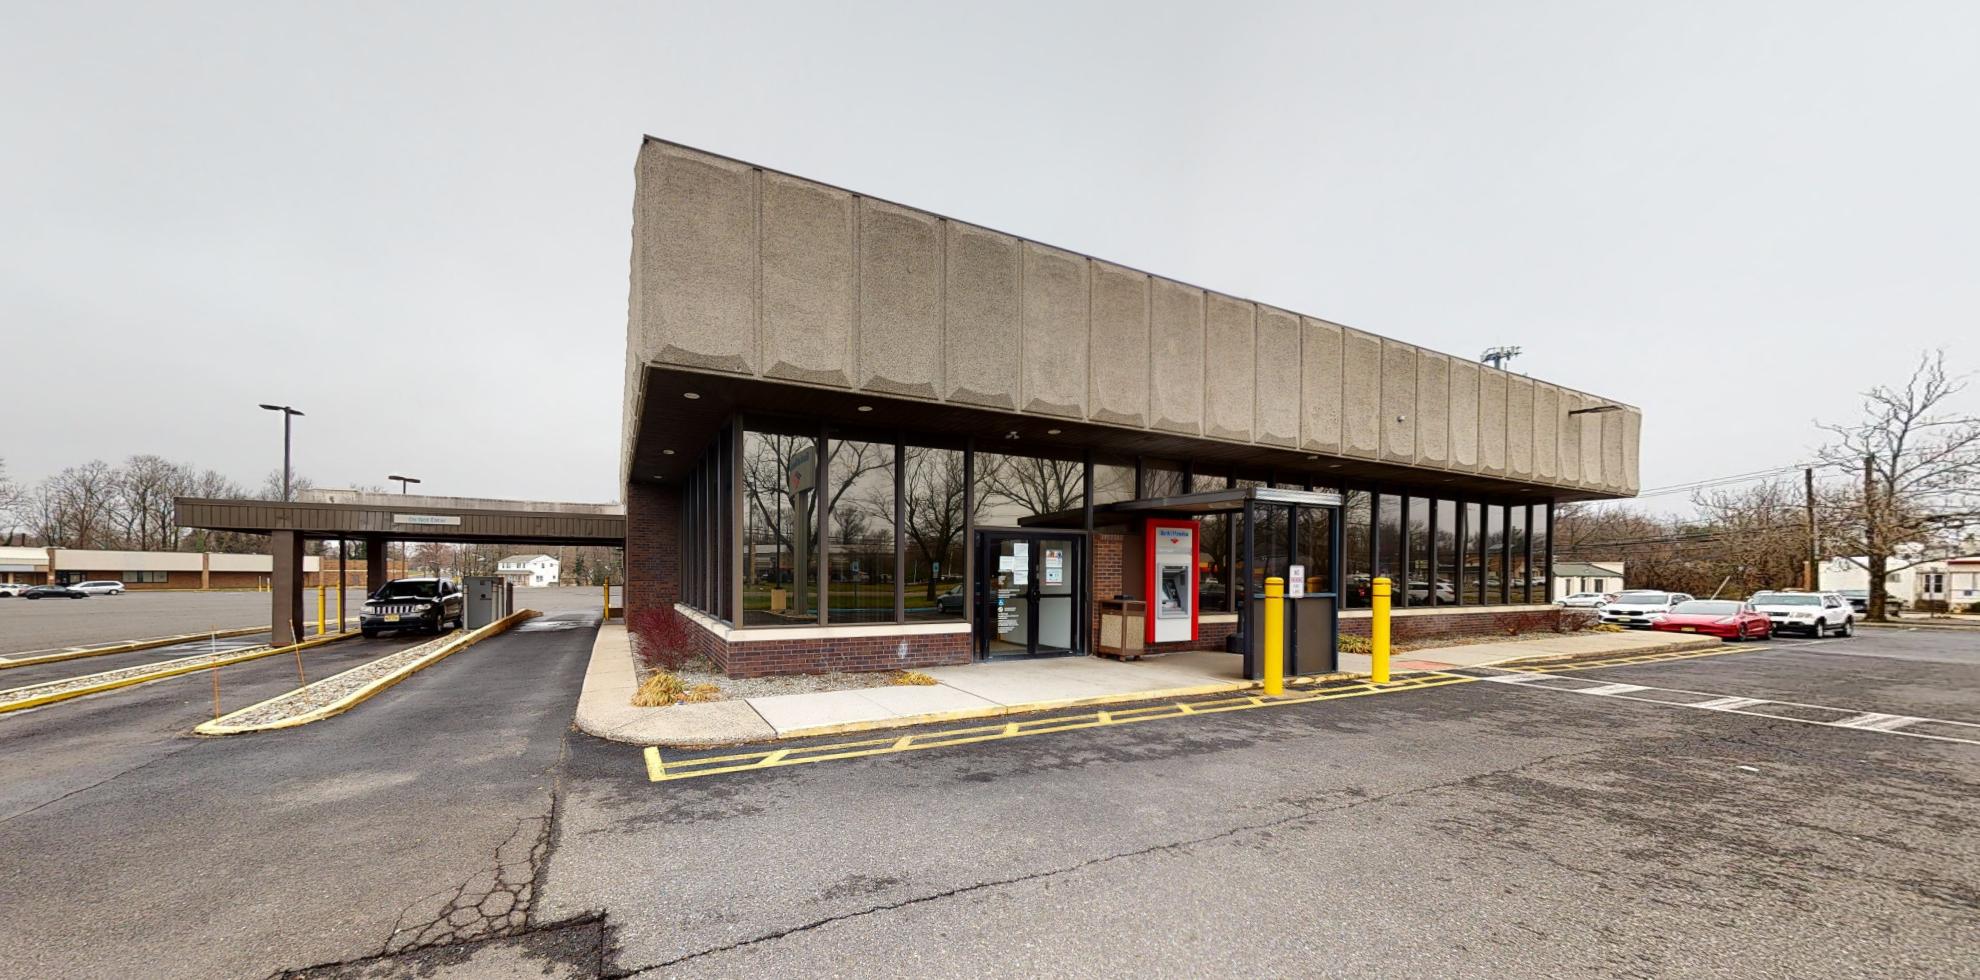 Bank of America financial center with drive-thru ATM | 875 Mantua Pike, Woodbury, NJ 08096